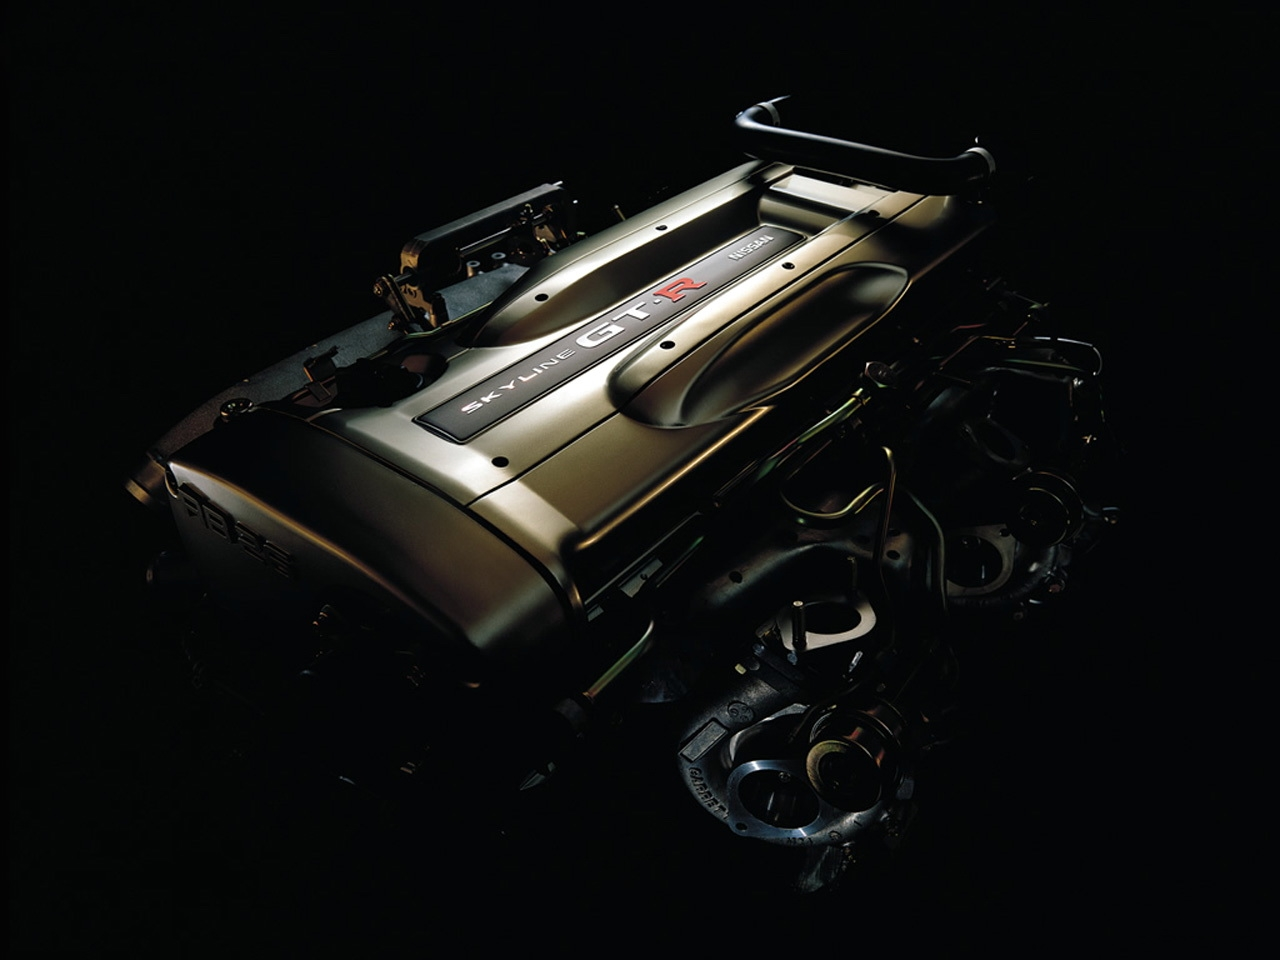 RB26DETT, najlepsze silniki R6, solidne